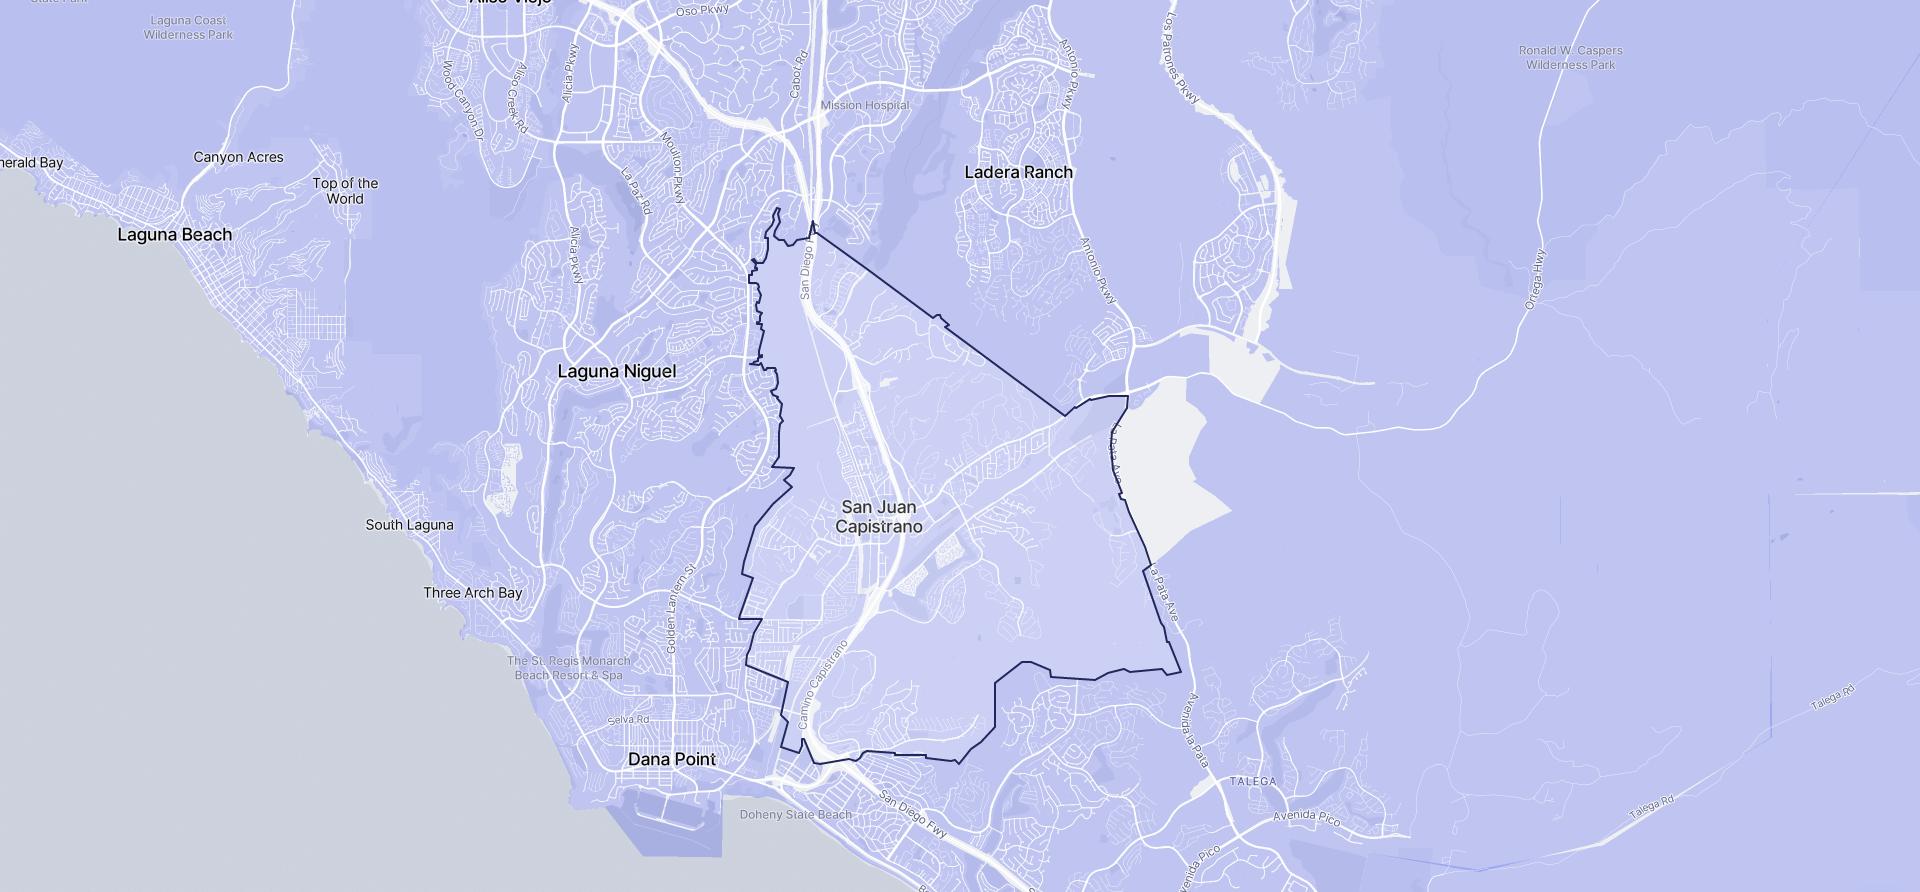 Image of San Juan Capistrano boundaries on a map.